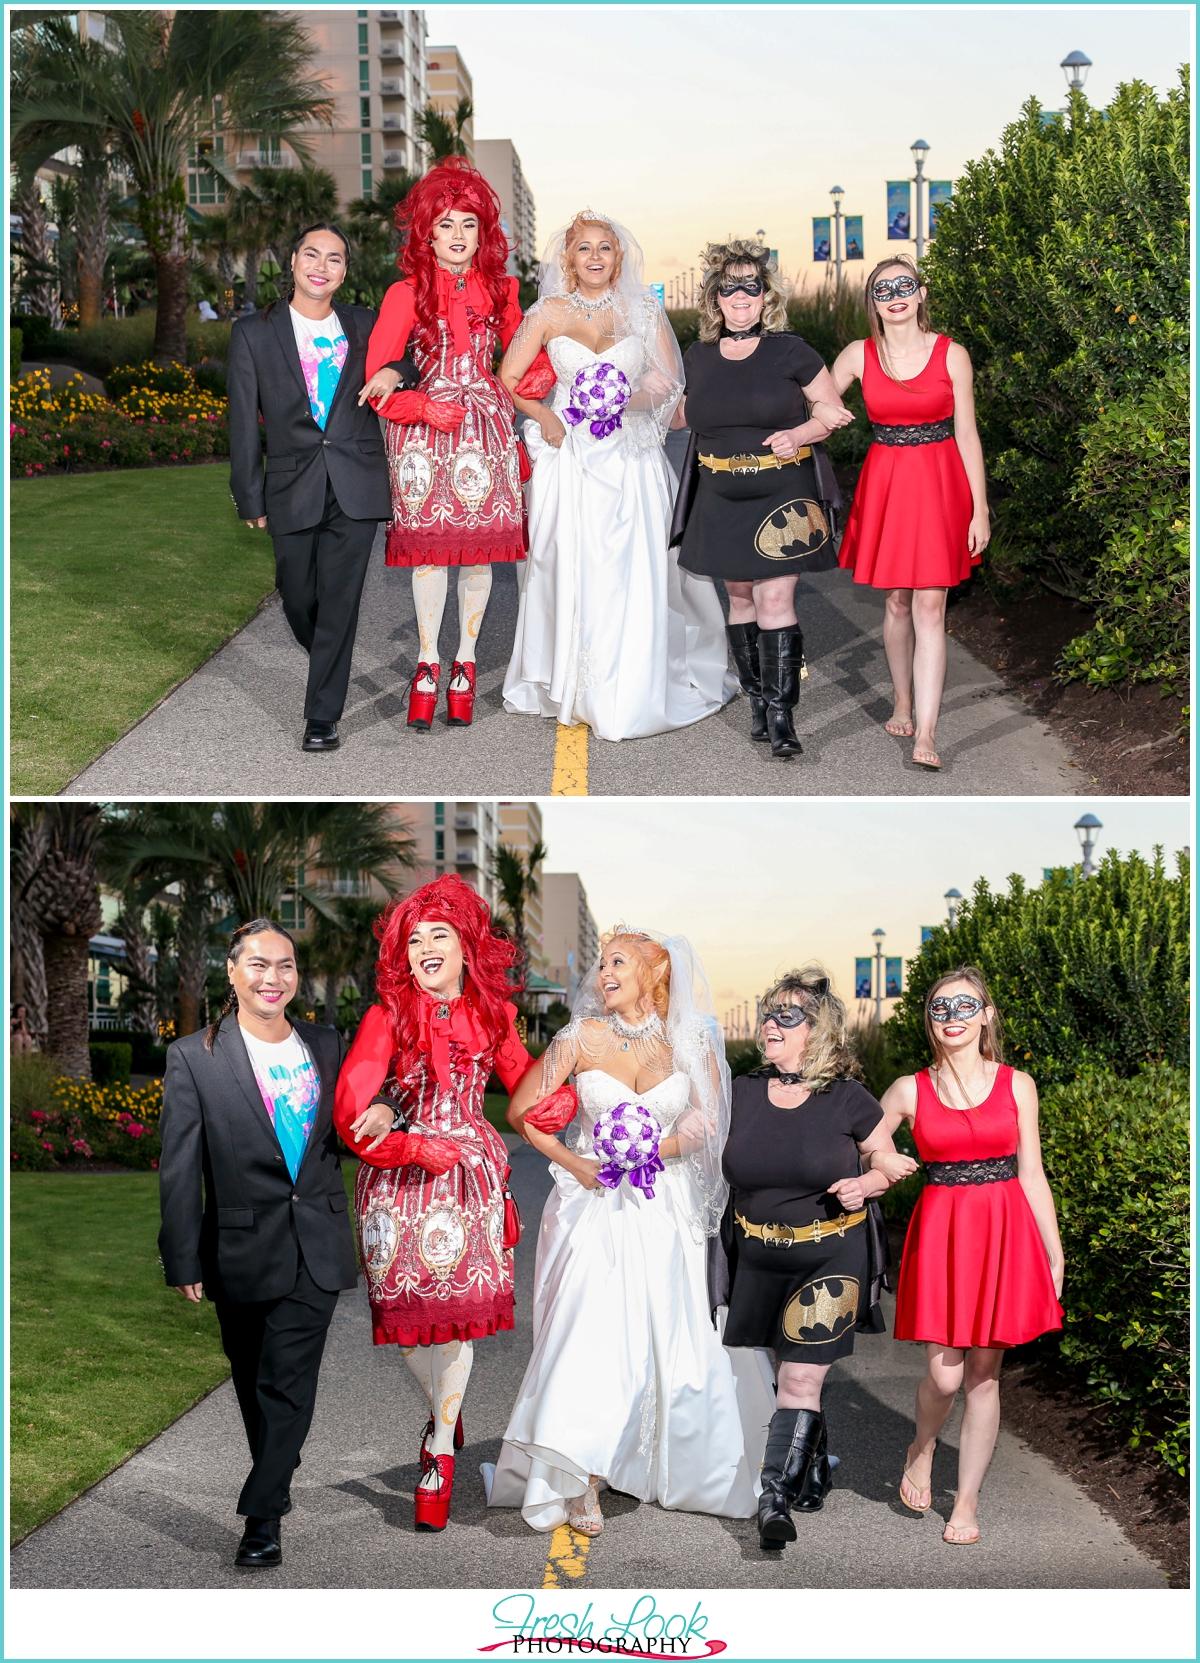 Virginia Beach cosplay wedding photographer